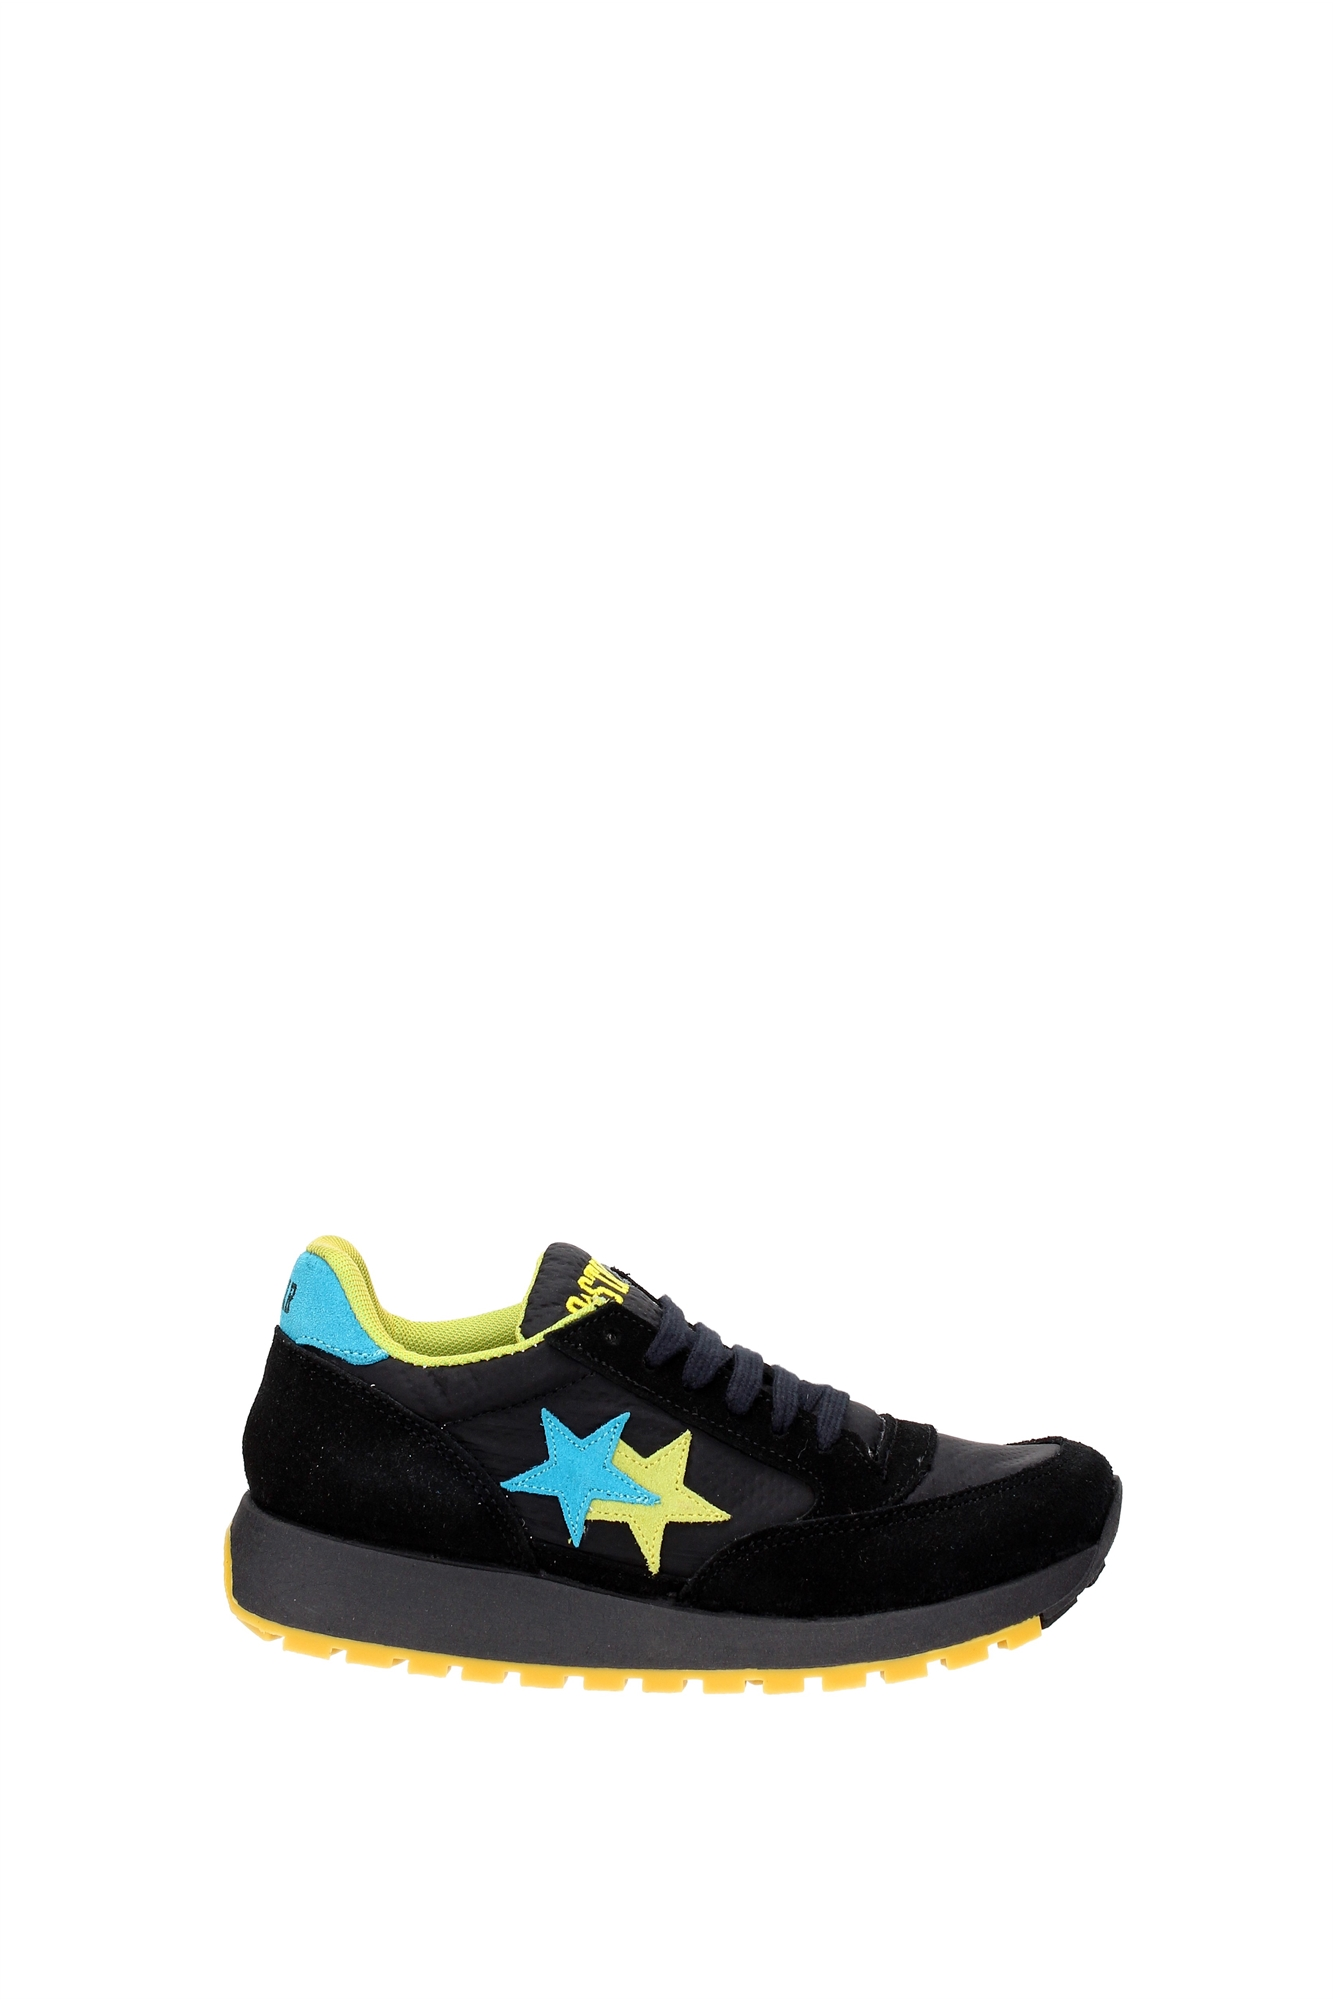 Sneakers 2star Damenschuhe - - Damenschuhe Camoscio (2SD1154NERO) 3274a7